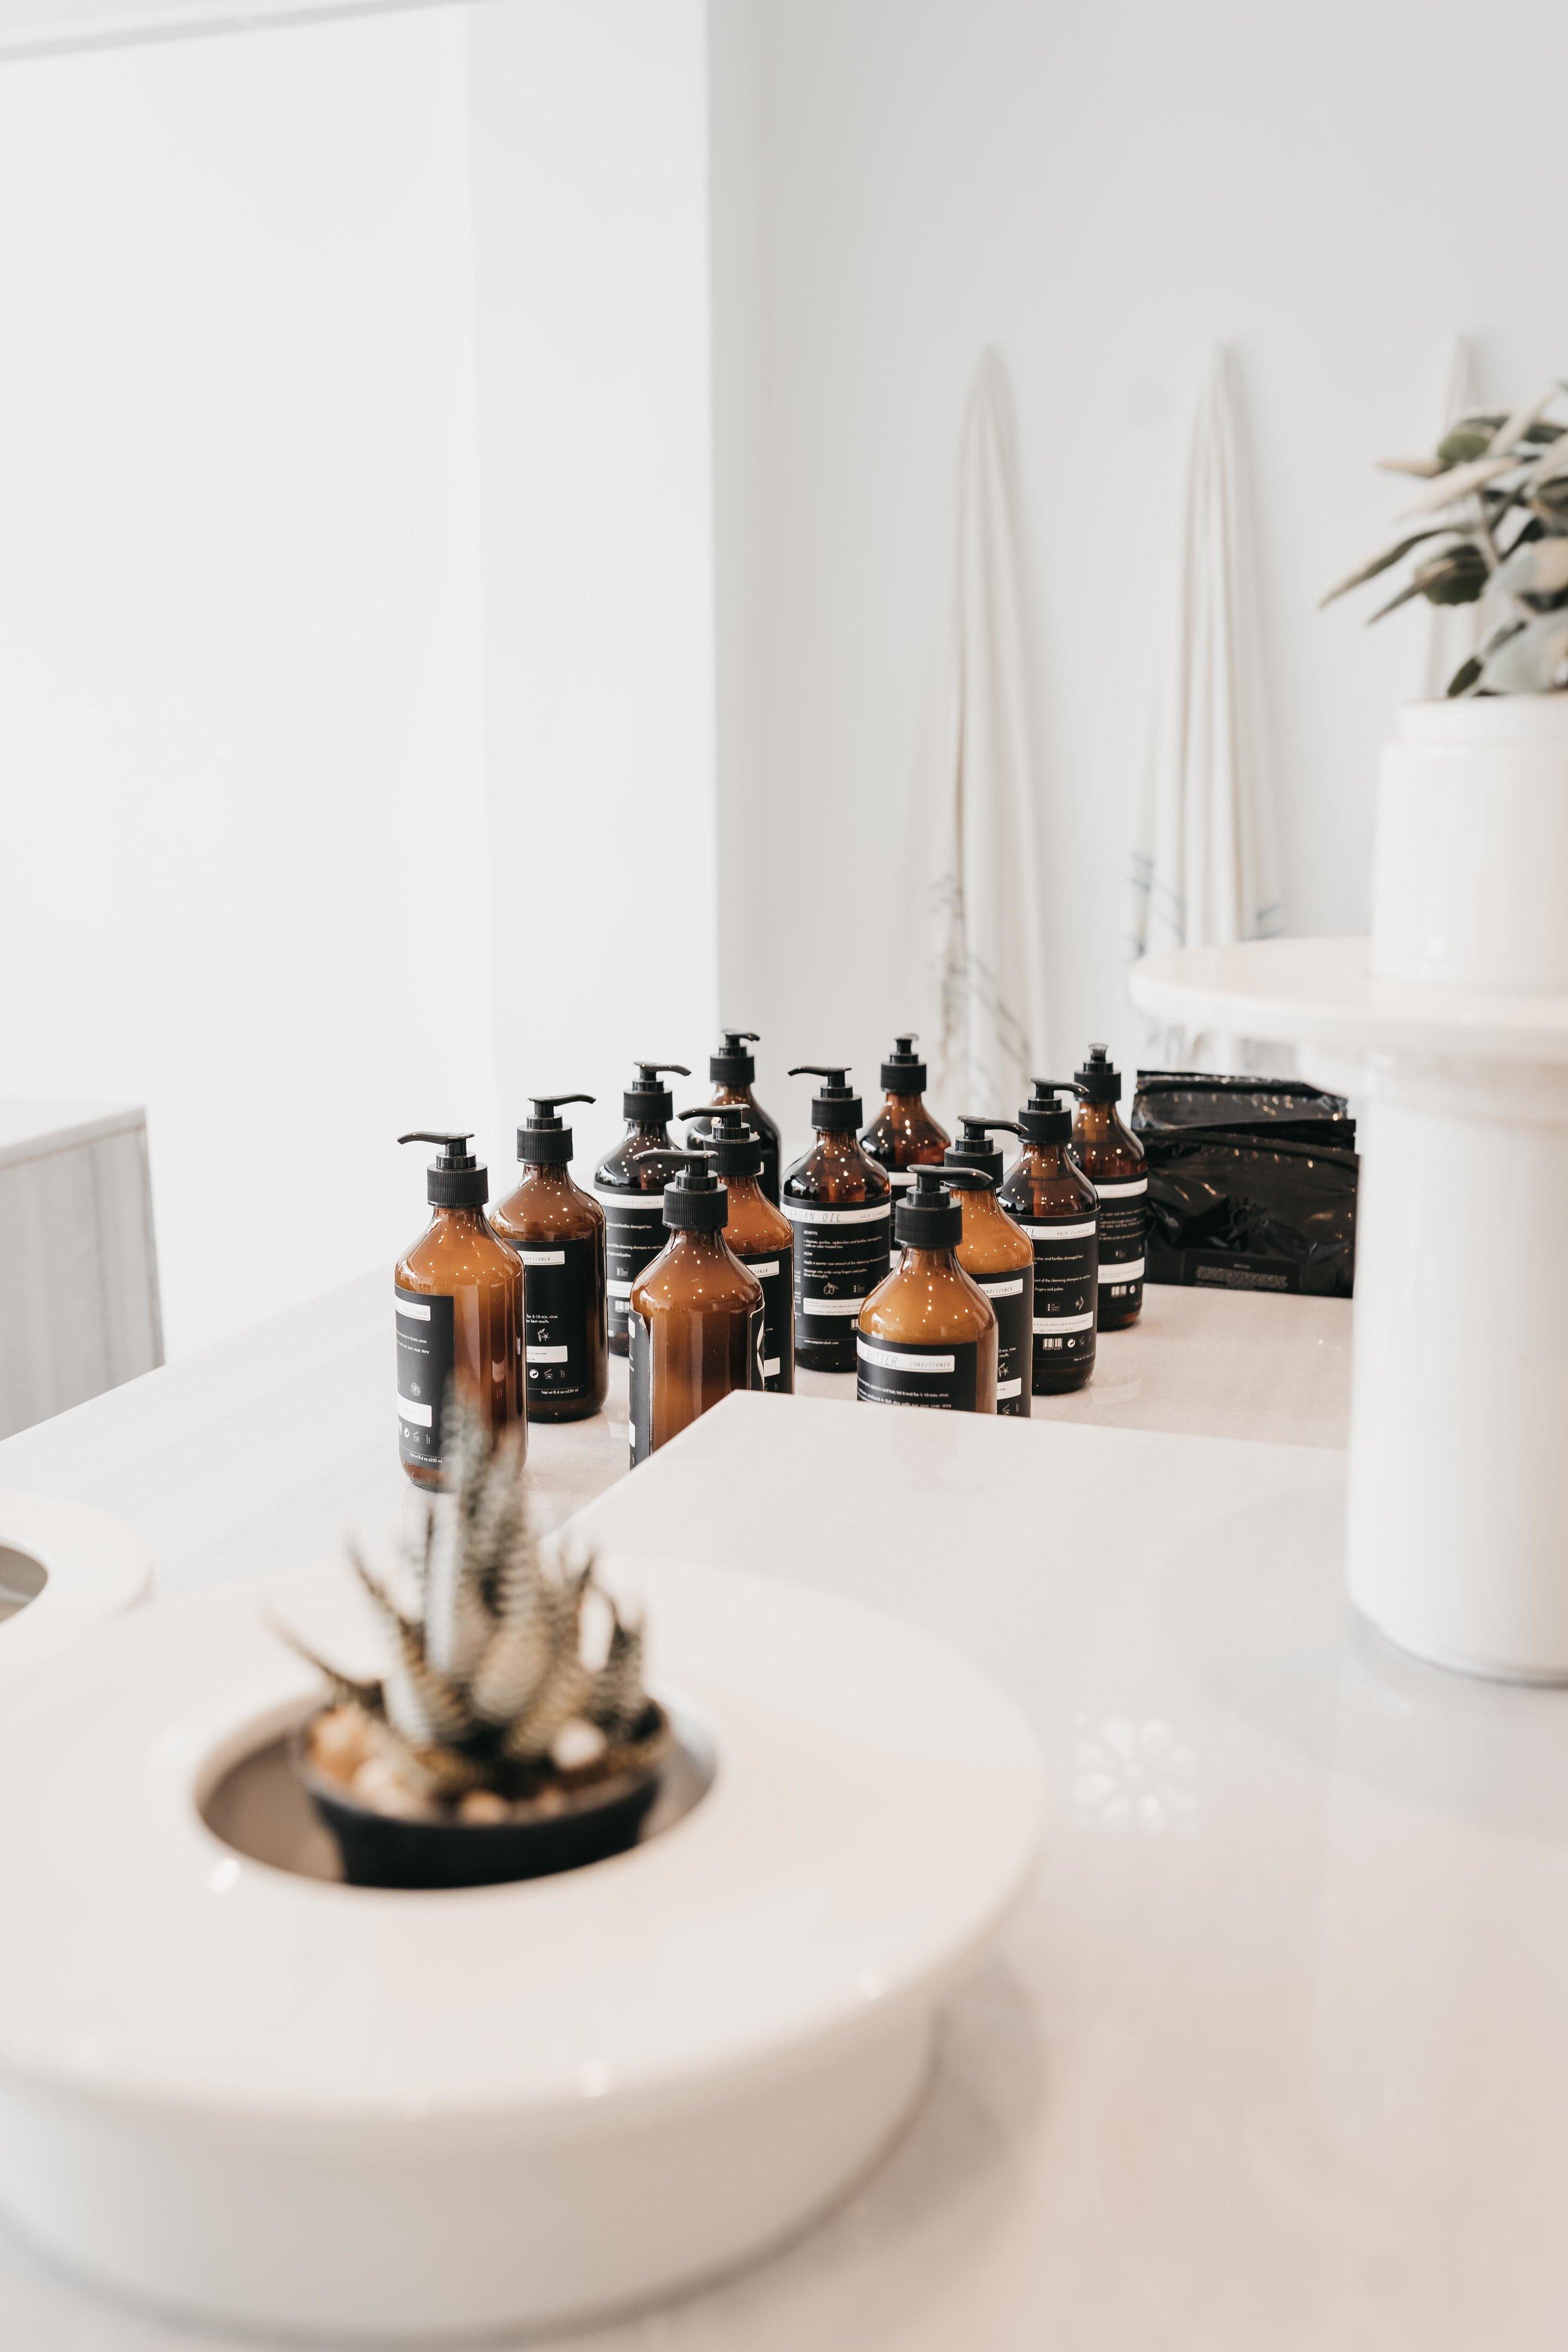 Keira-Mason-Soap Story-products-on-the-shelf.jpg